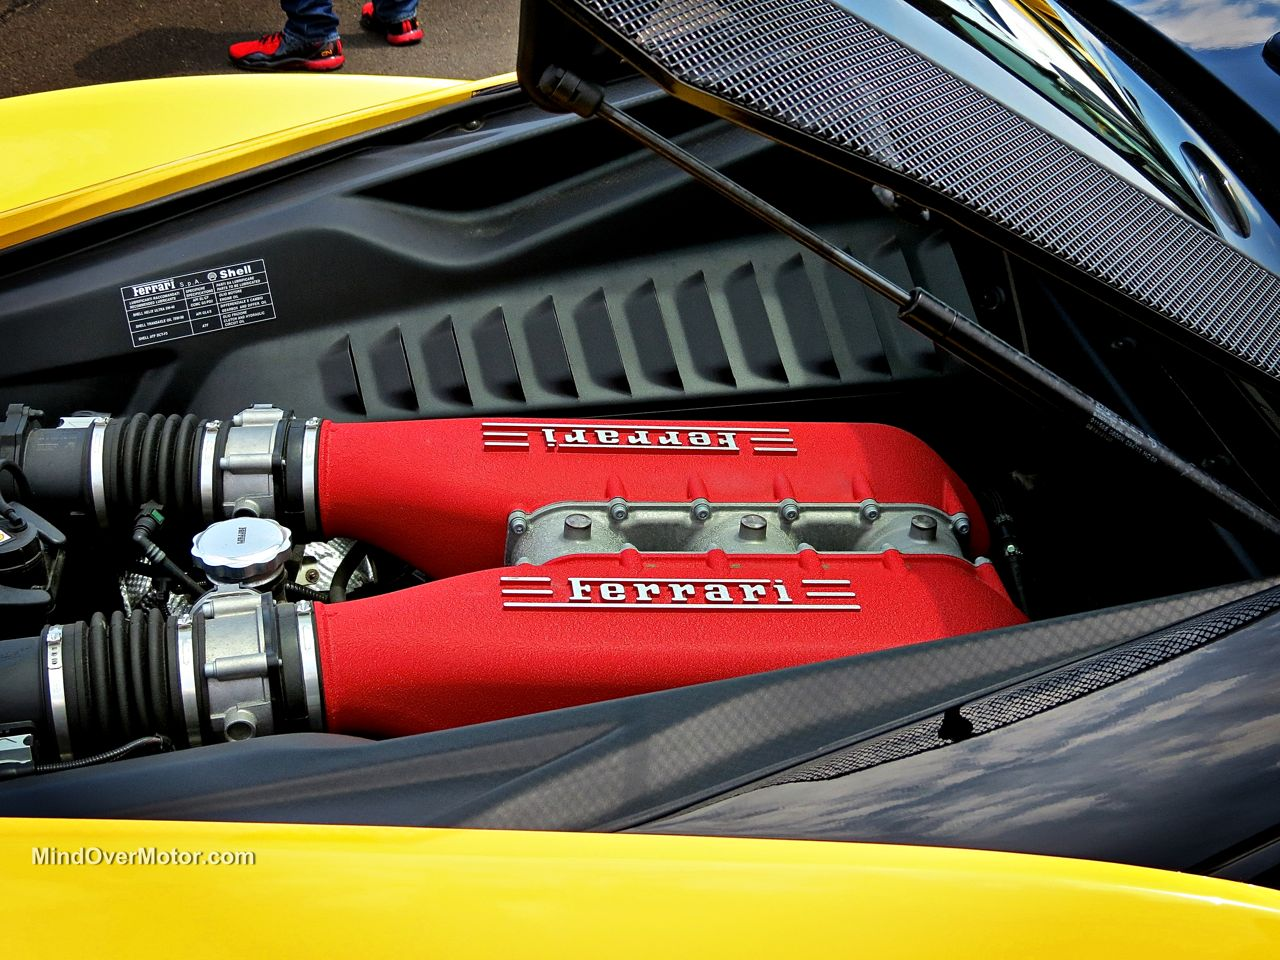 Ferrari 458 Engine at CF Charities